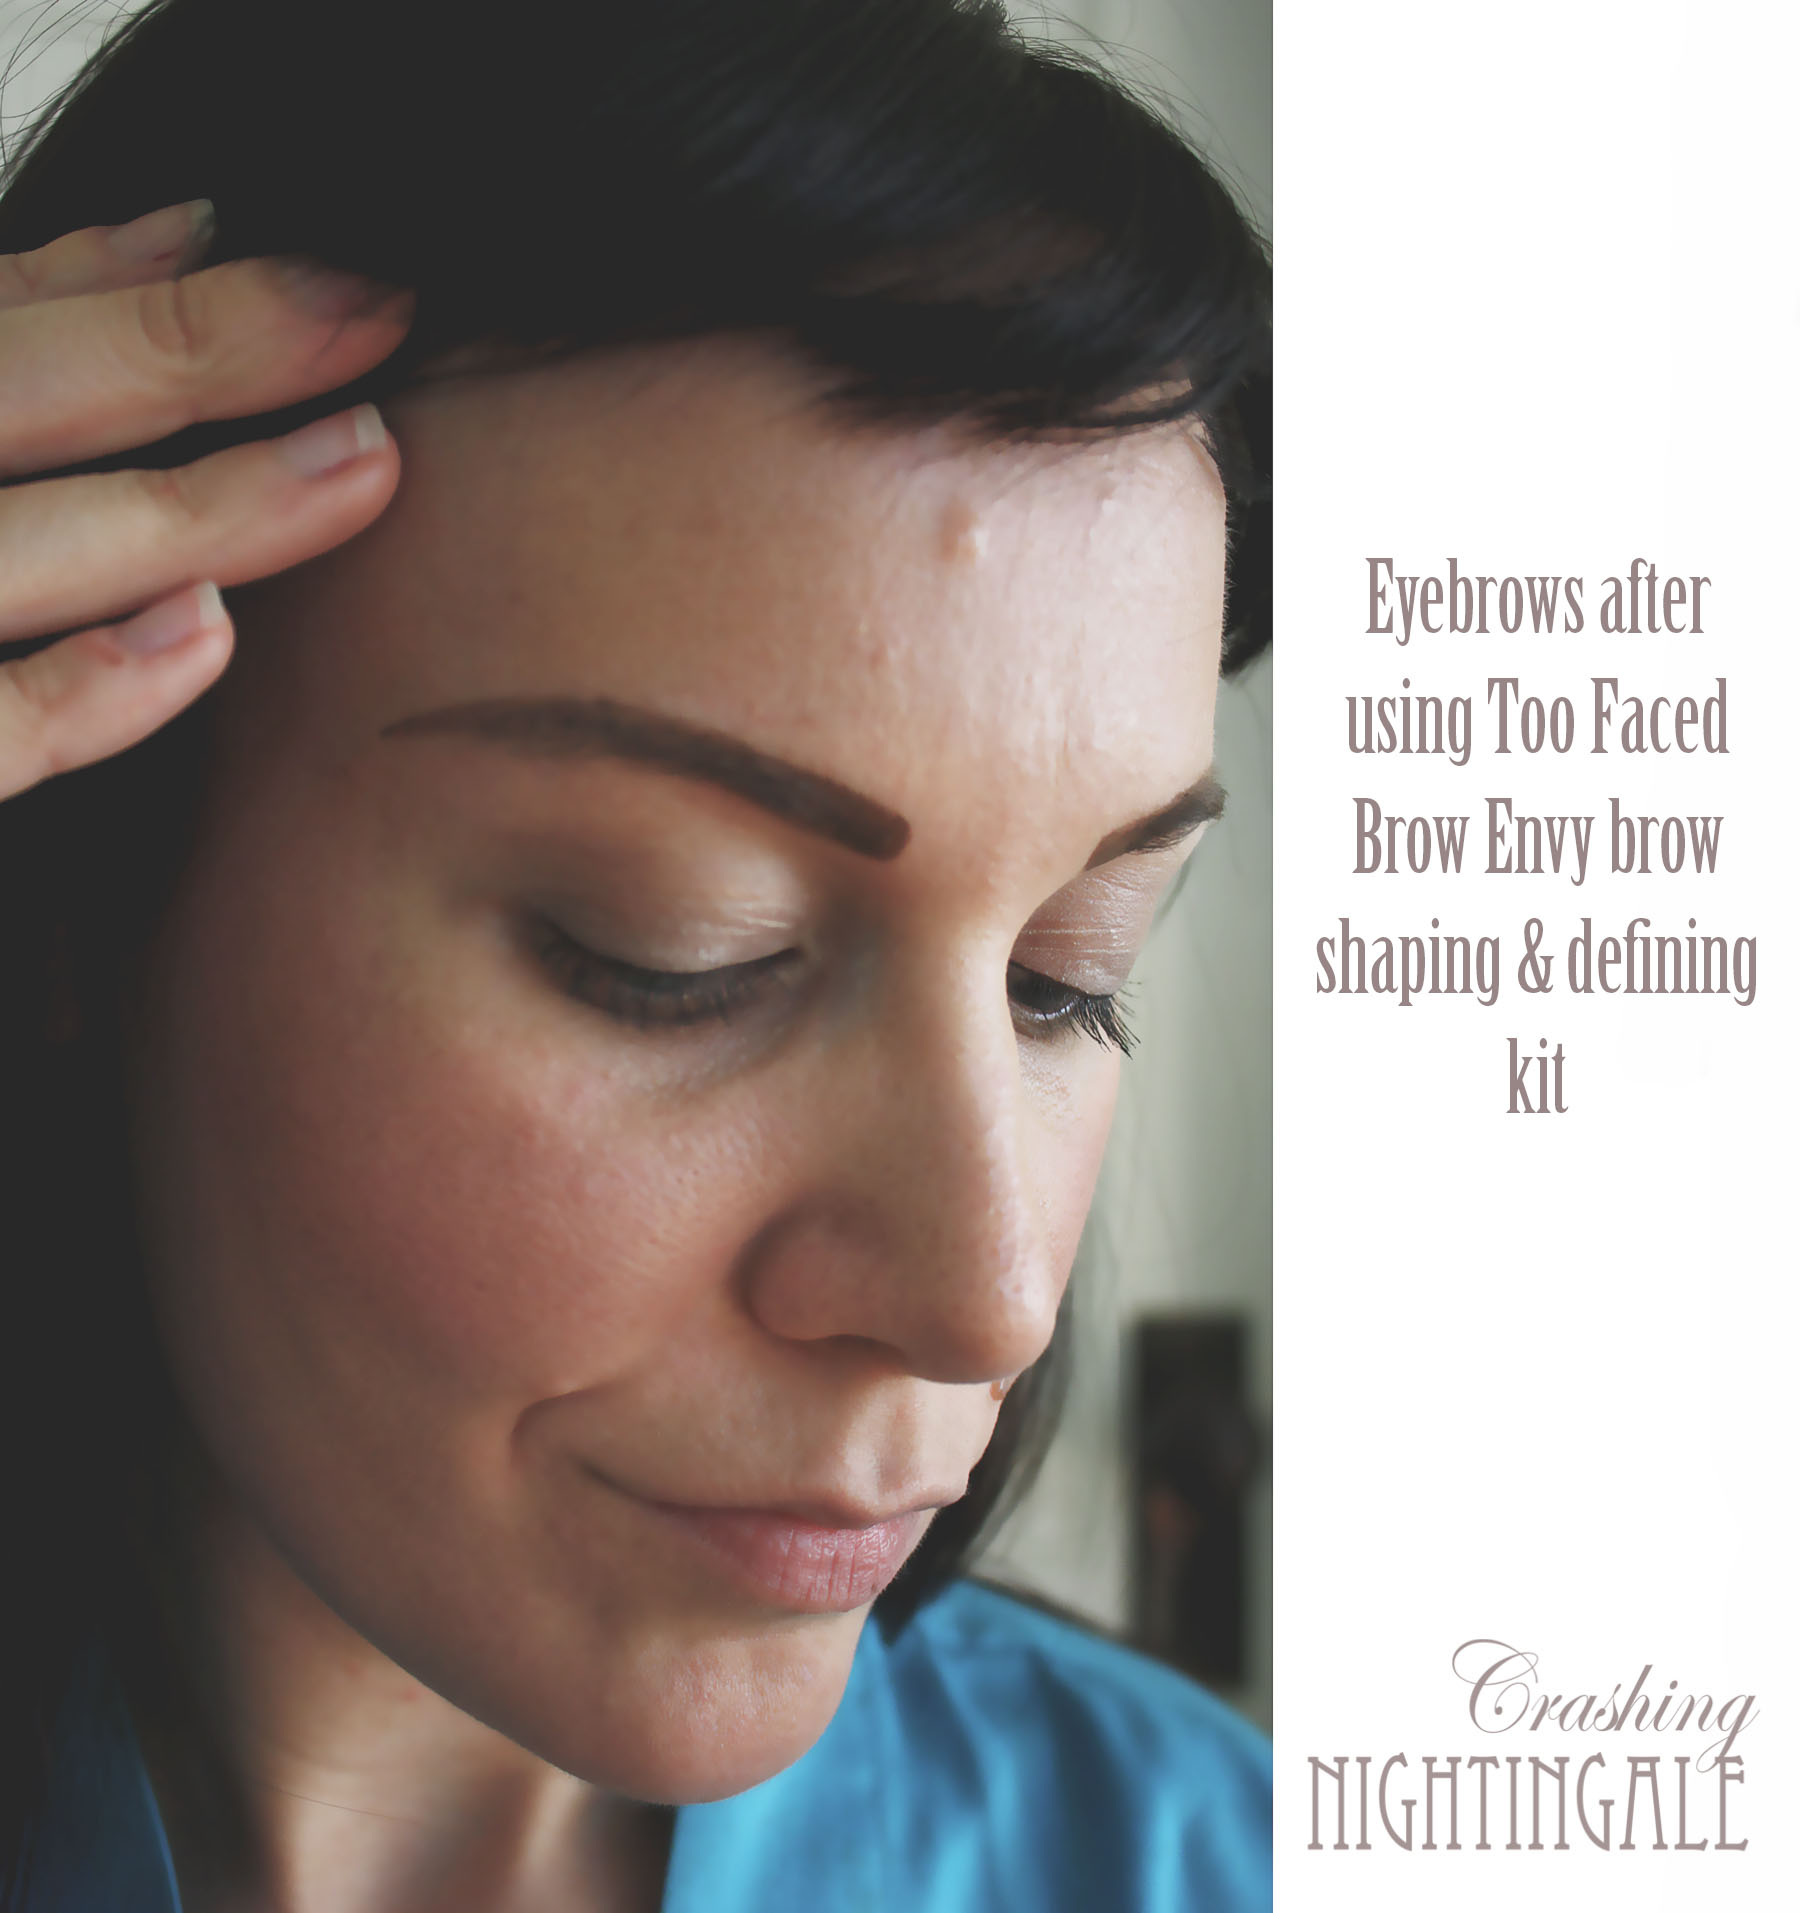 Brow Envy Shaping And Defining Kit Crashing Nightingale